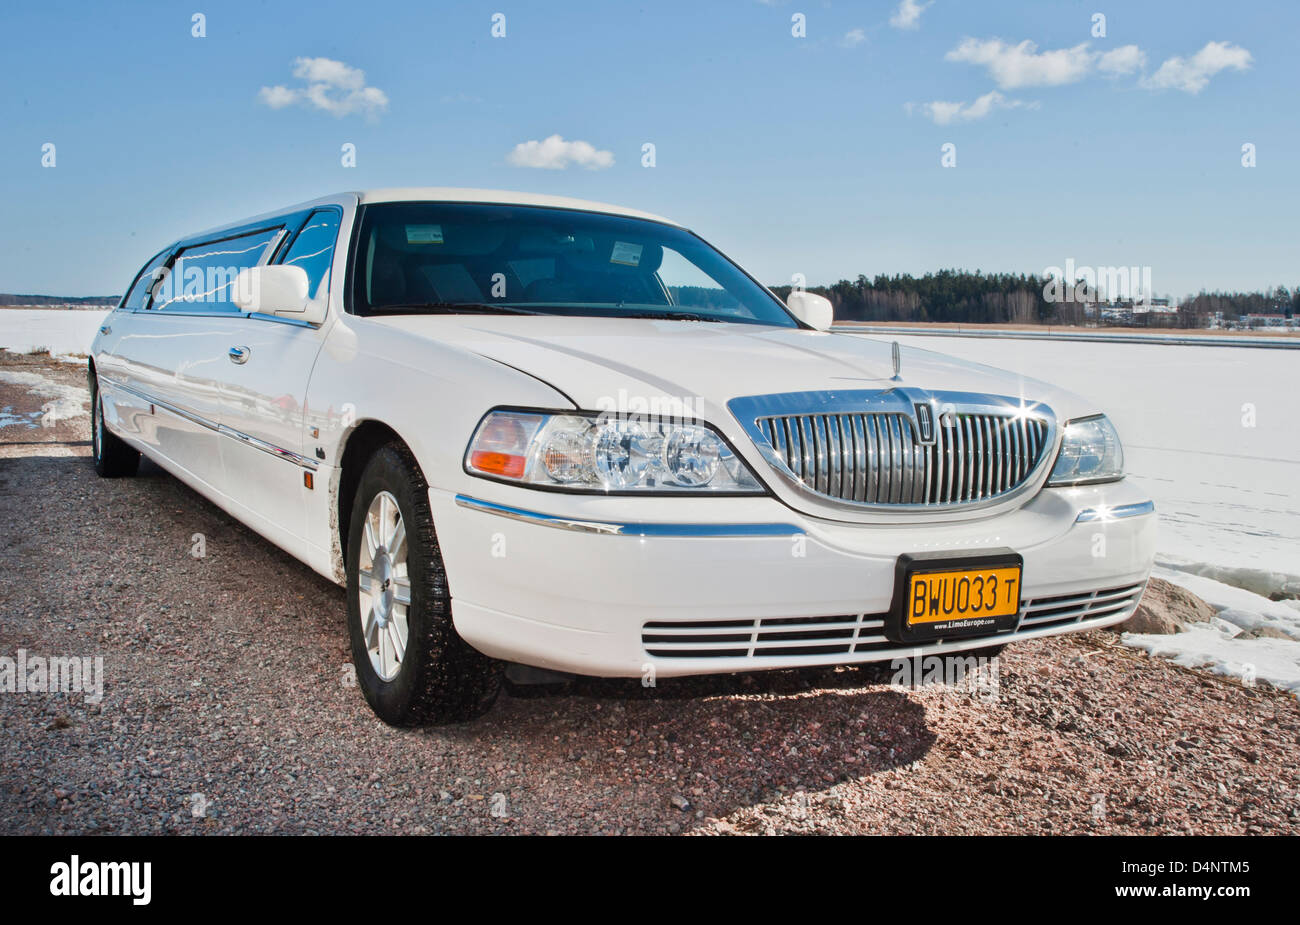 limousine - Stock Image